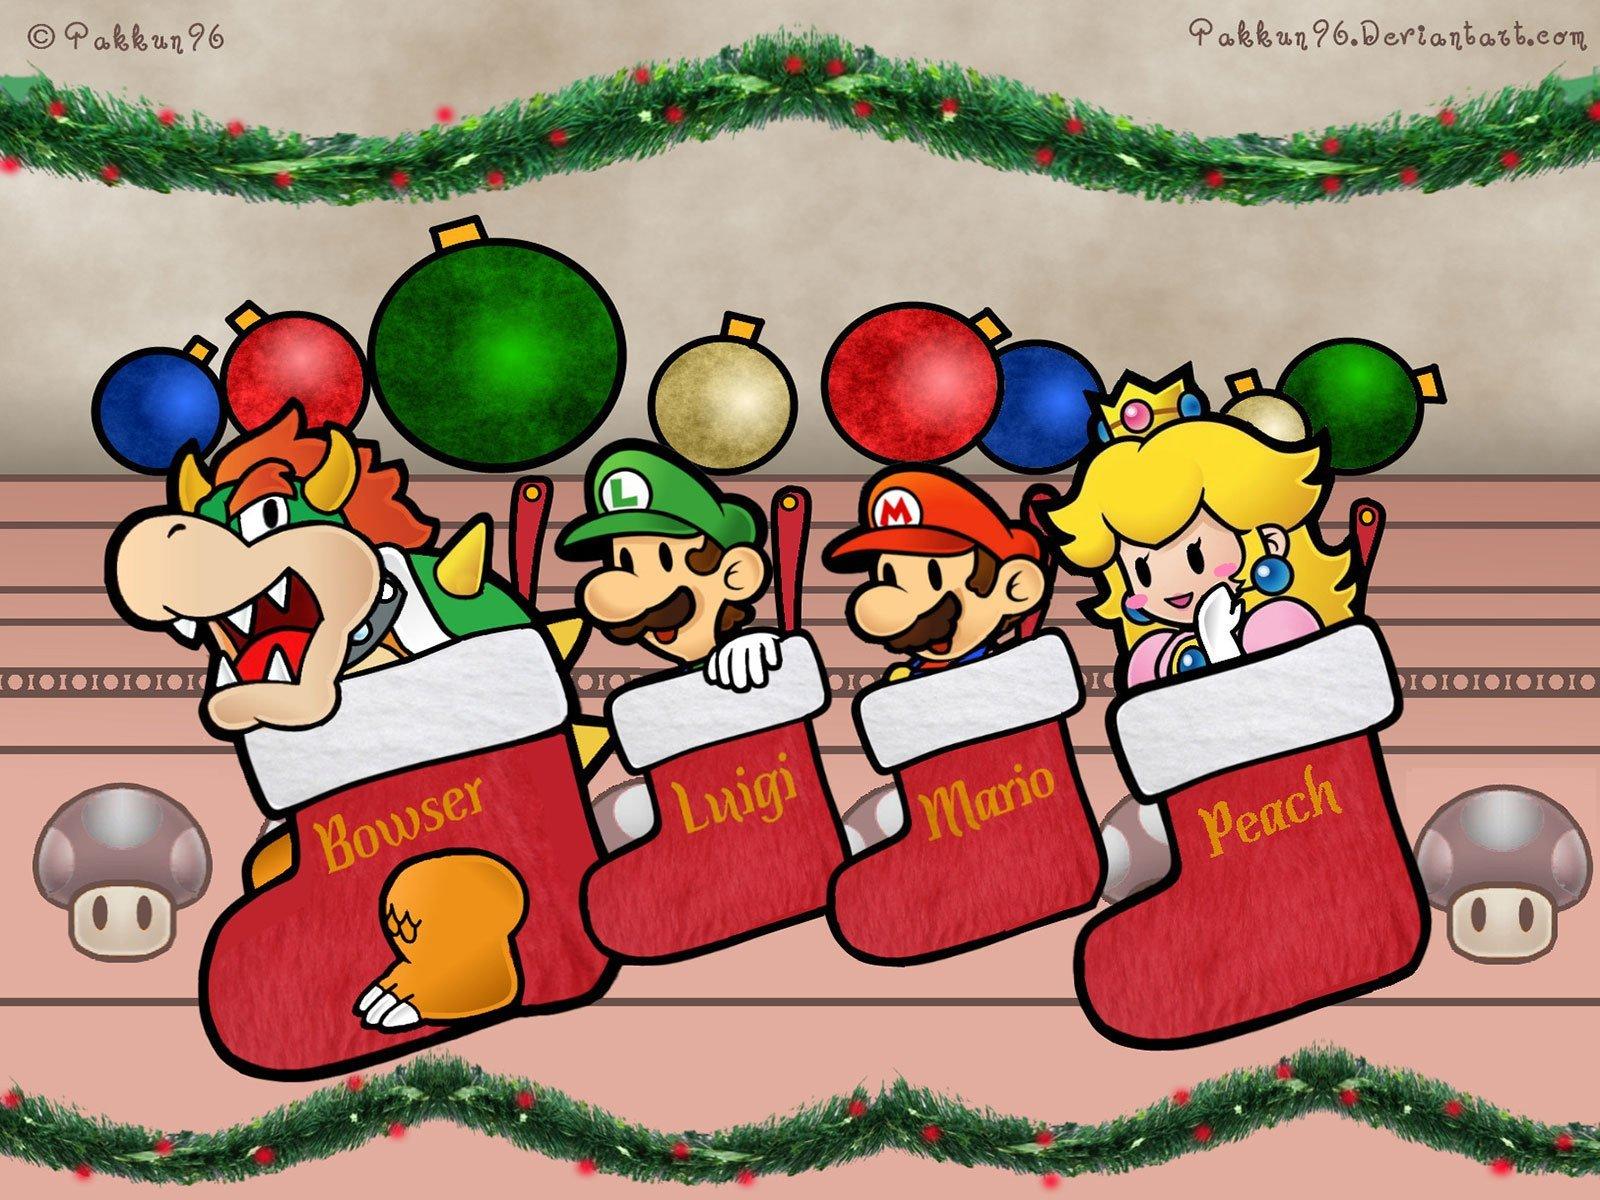 SONIC Personalised Christmas Card game sega hedgehog happy xmas holiday